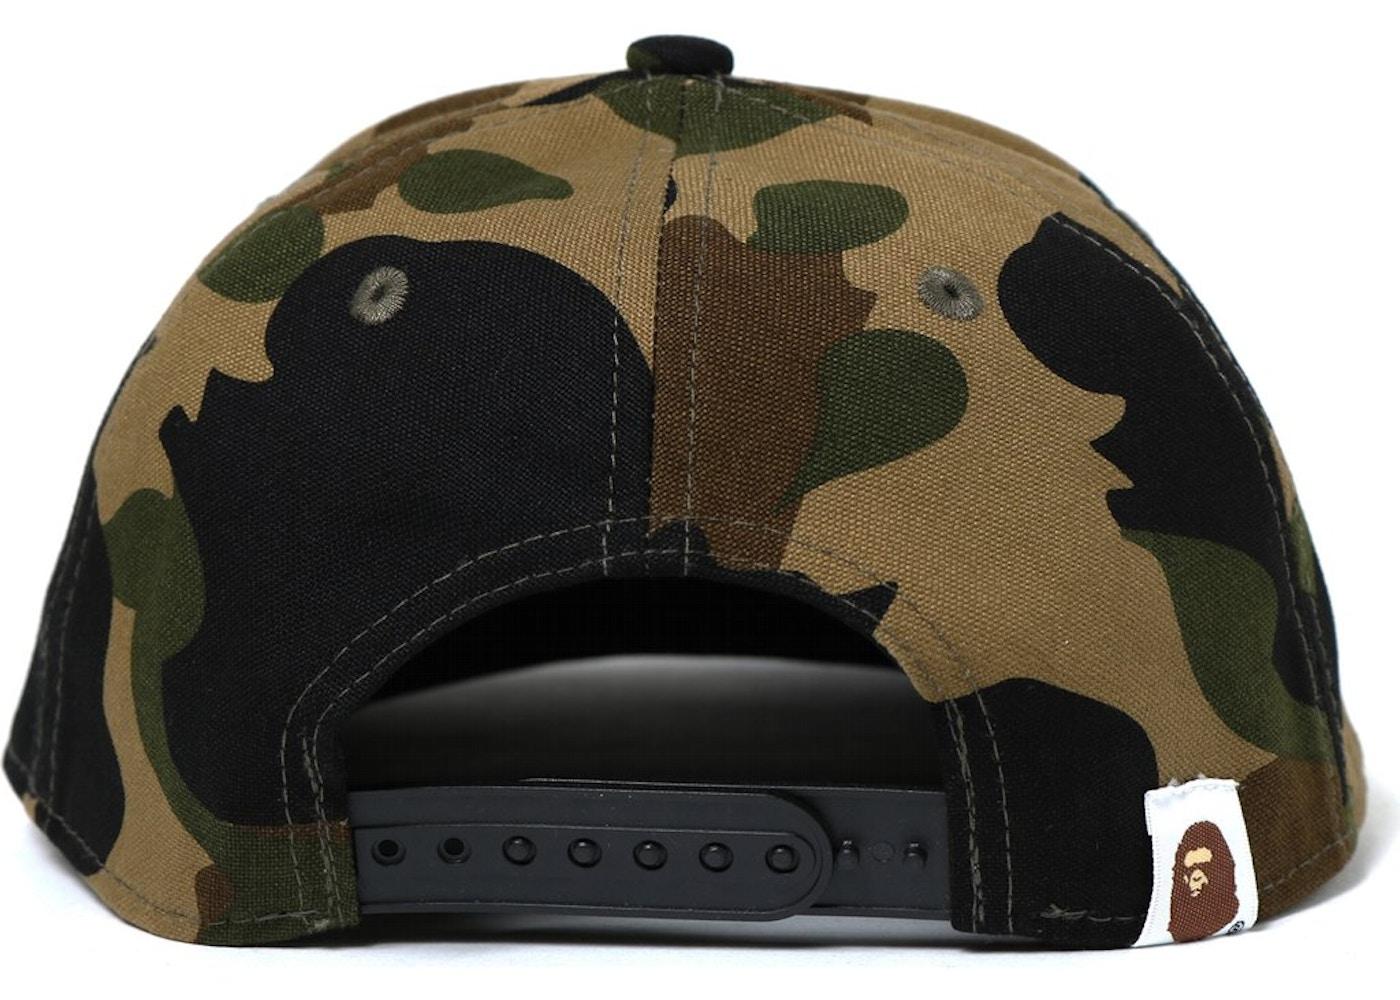 c848a0cab8d44 Streetwear - Bape Headwear - Last Sale